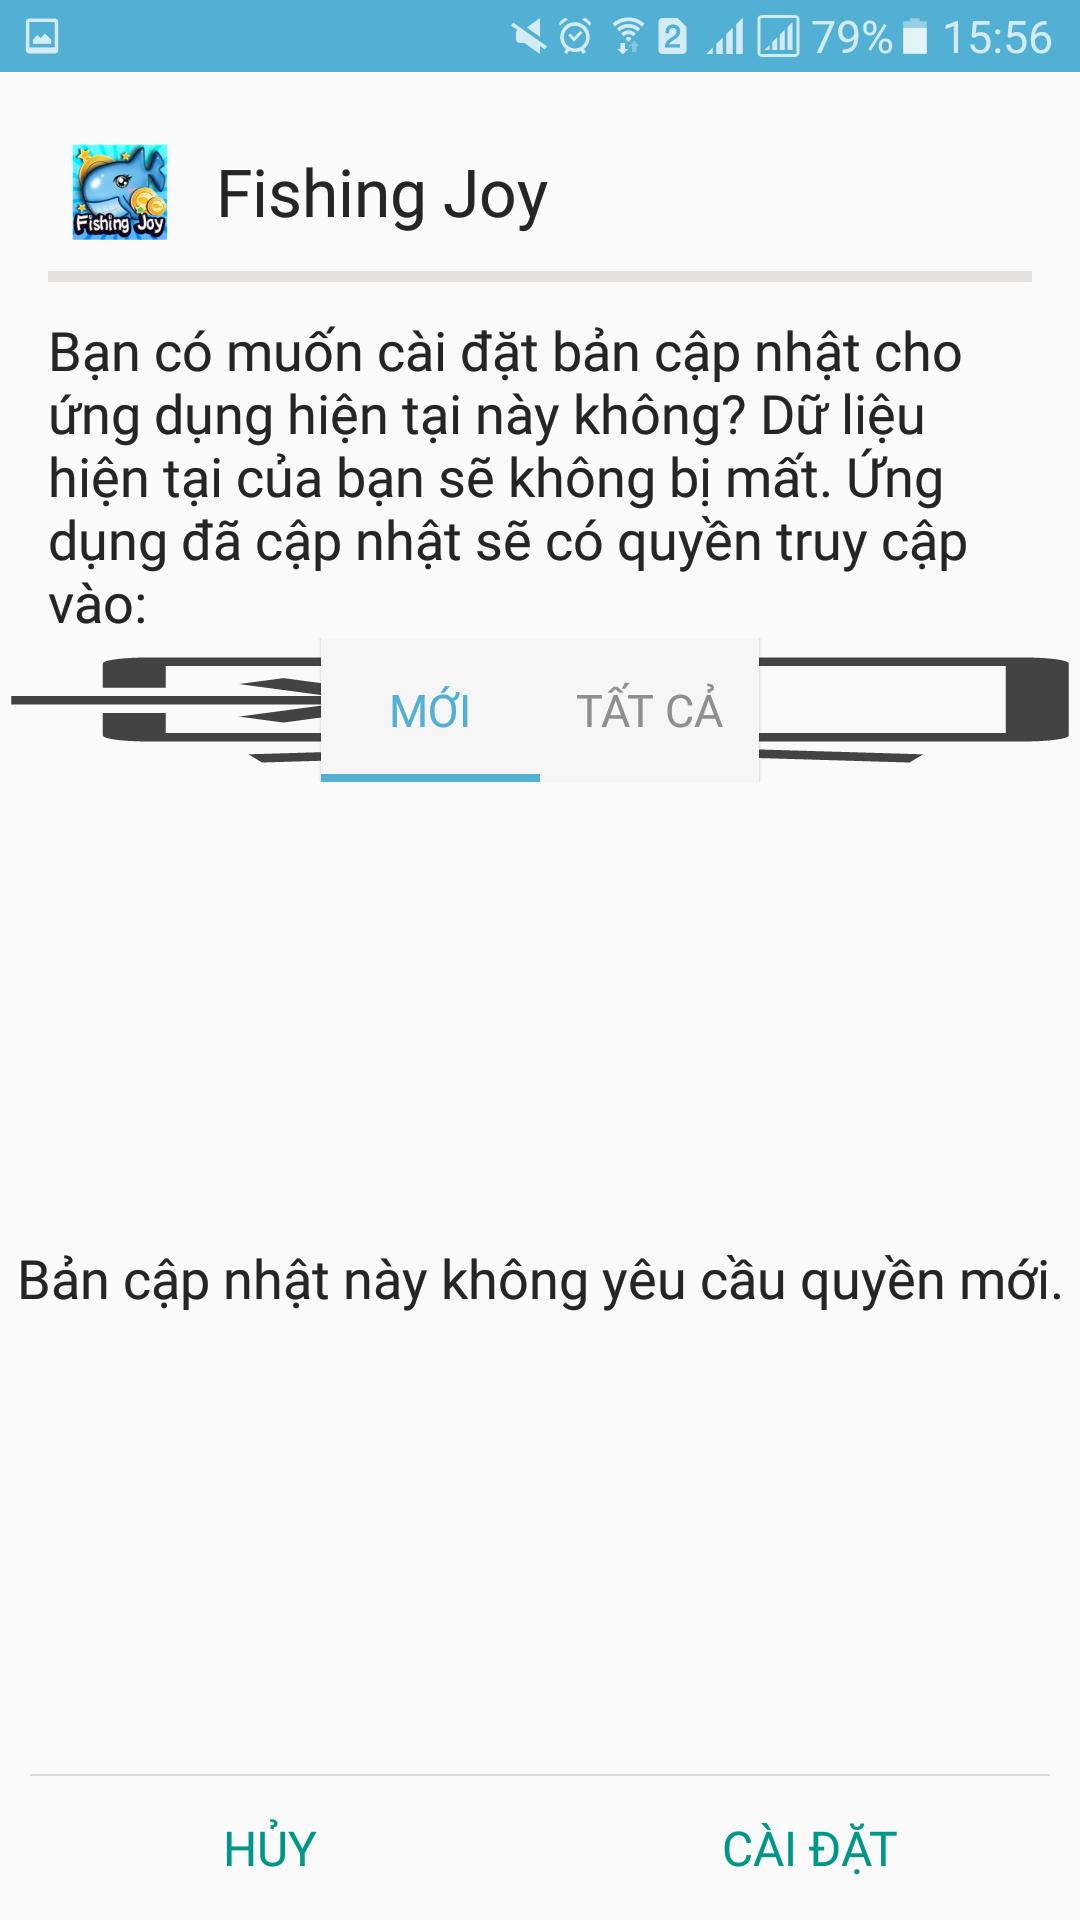 Cai dat game ban ca online tren dien thoai